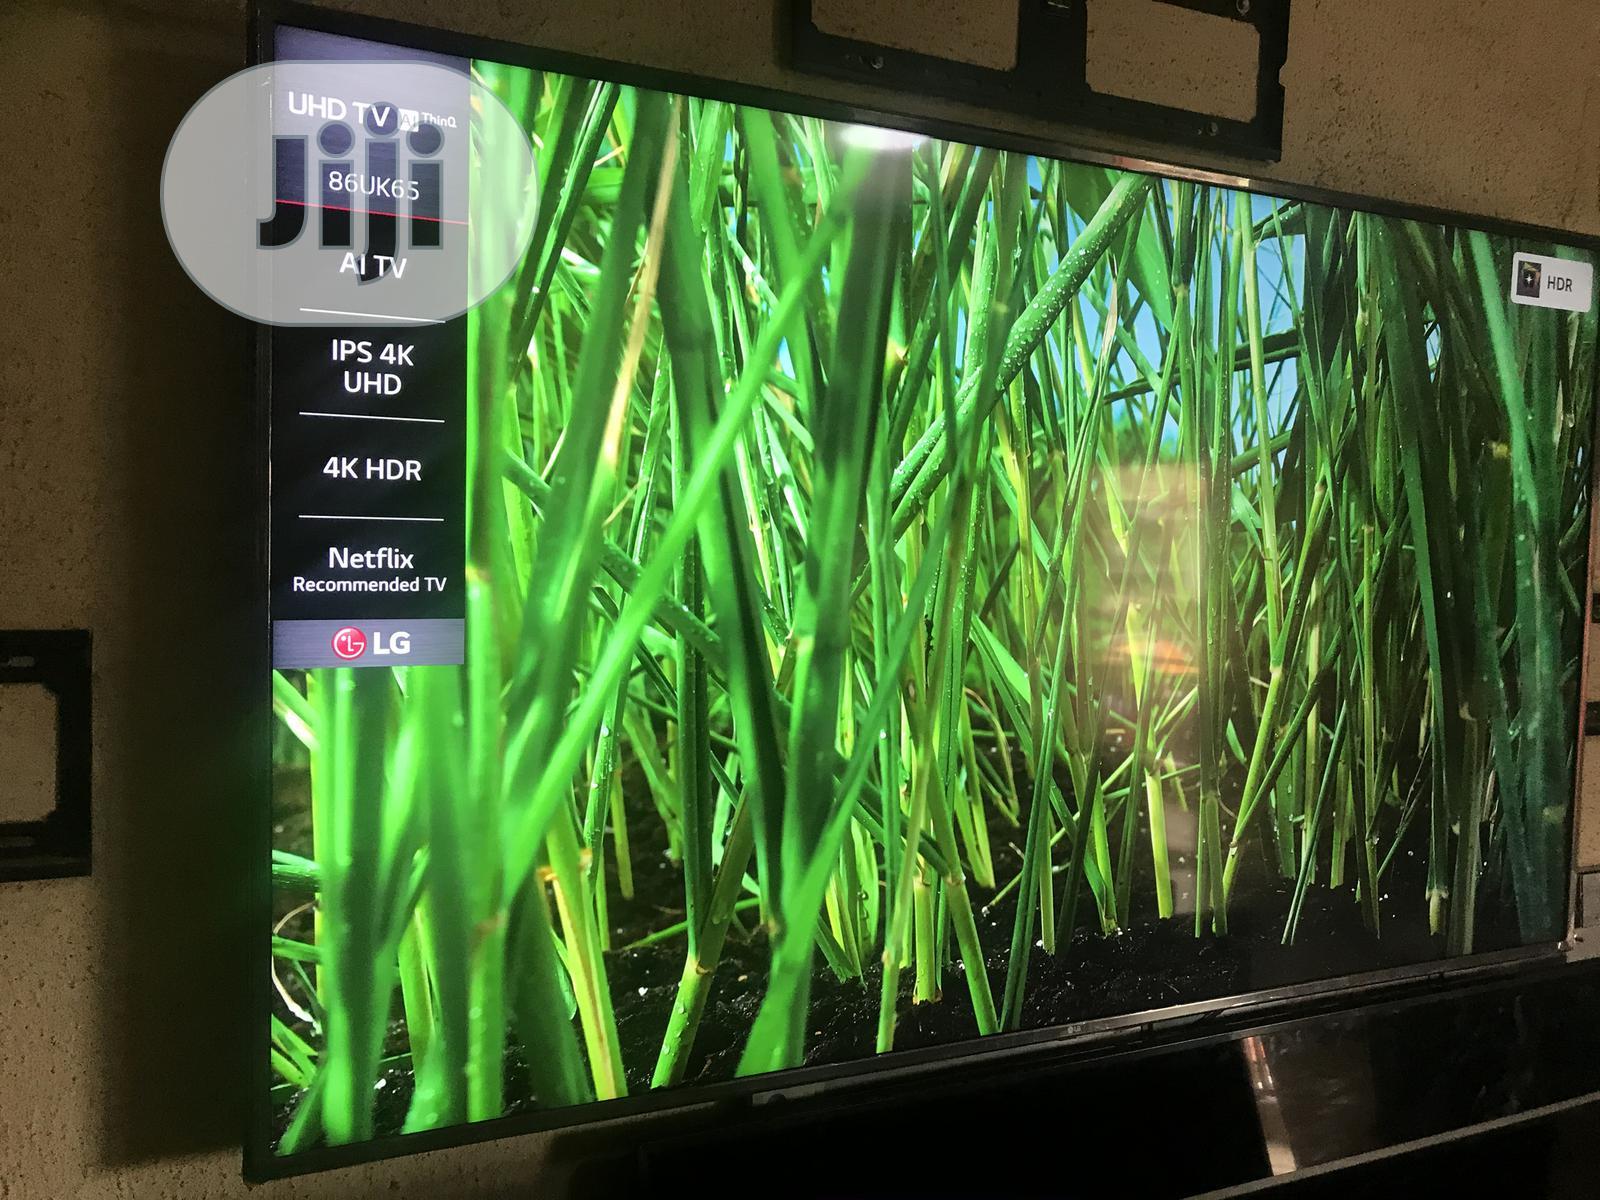 LG Ultra HD 4K TV 86 Inches